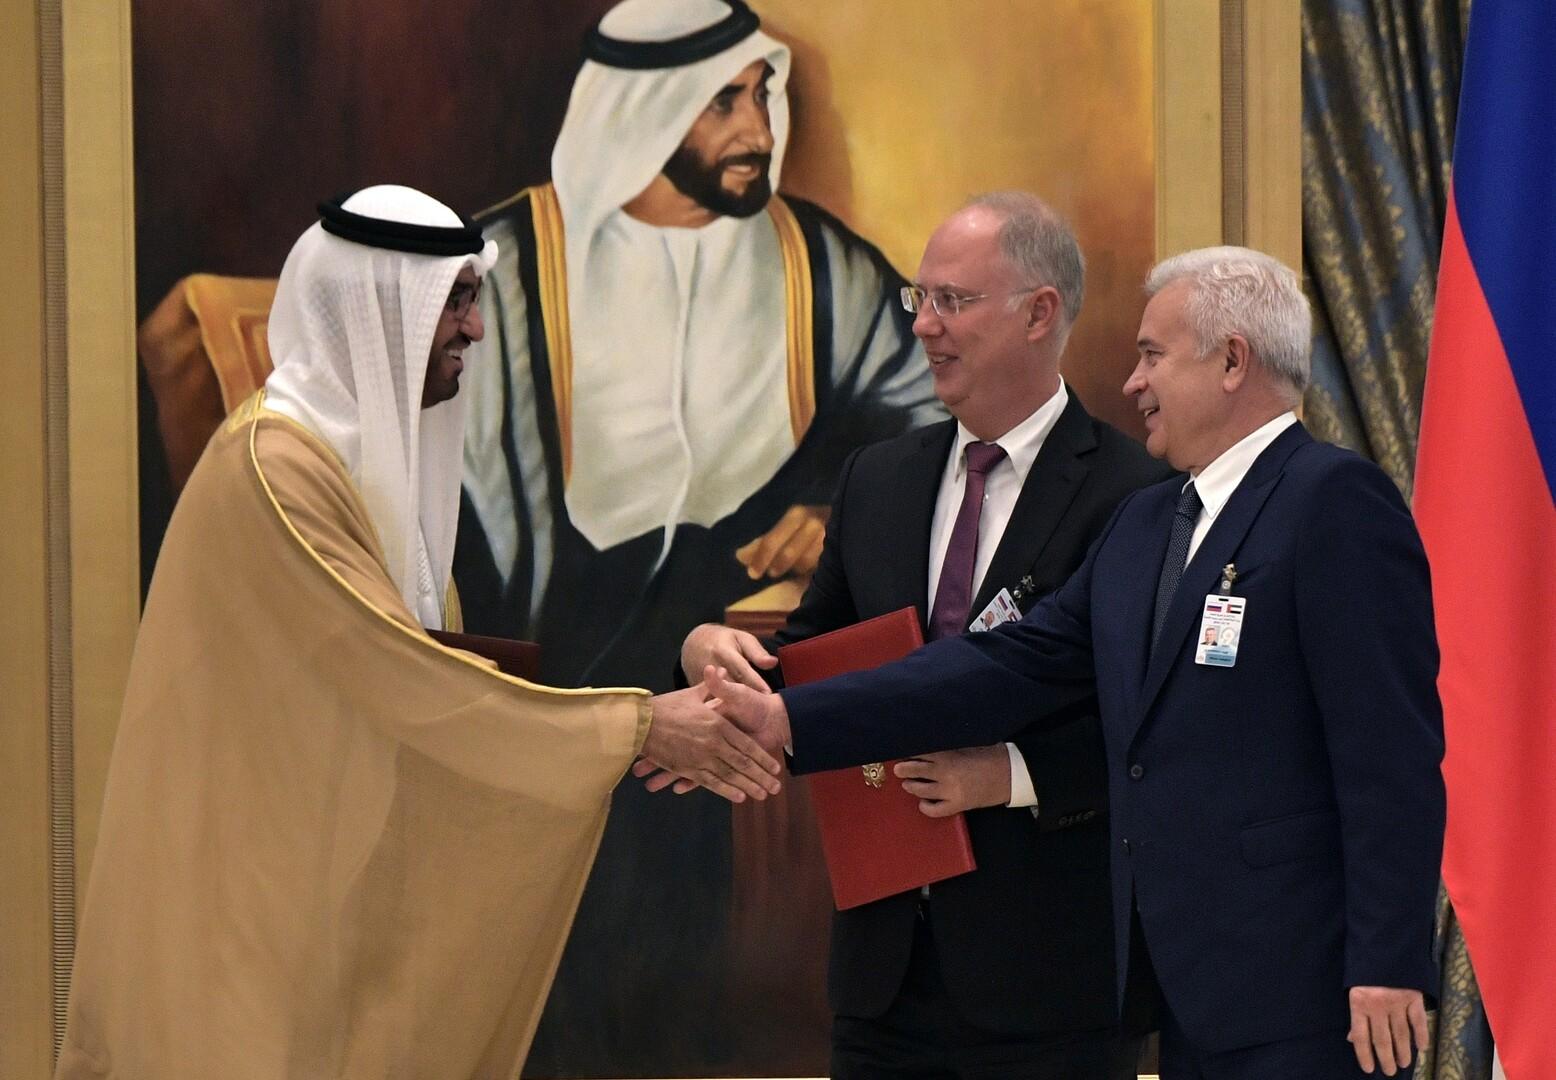 6 اتفاقات بين صندوق سيادي روسي و